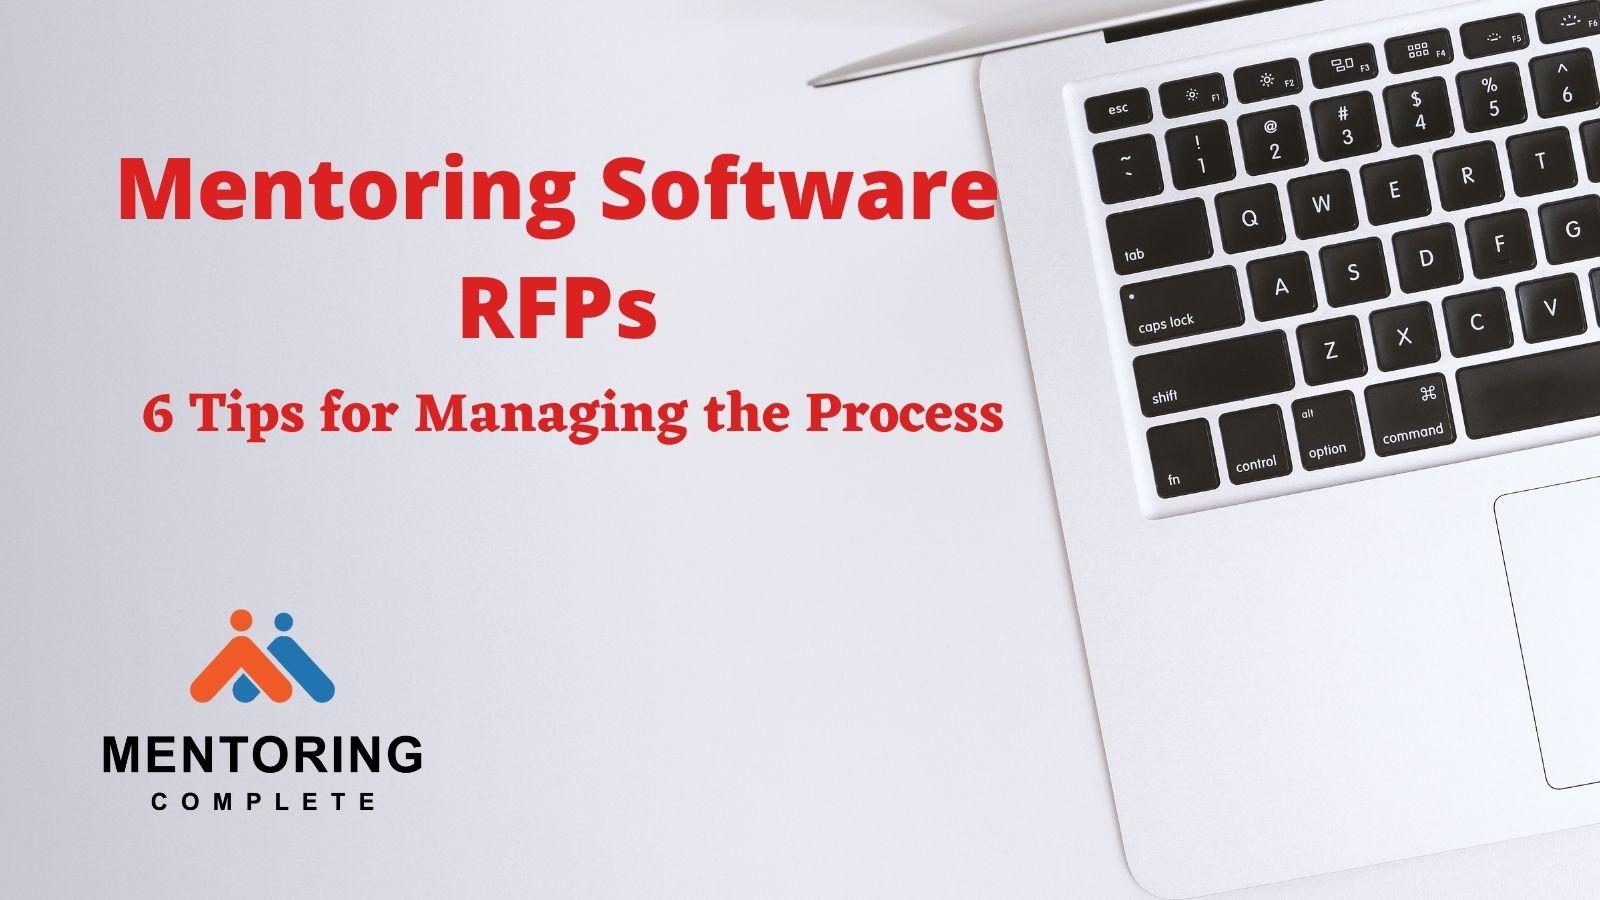 Mentoring Software RFPs